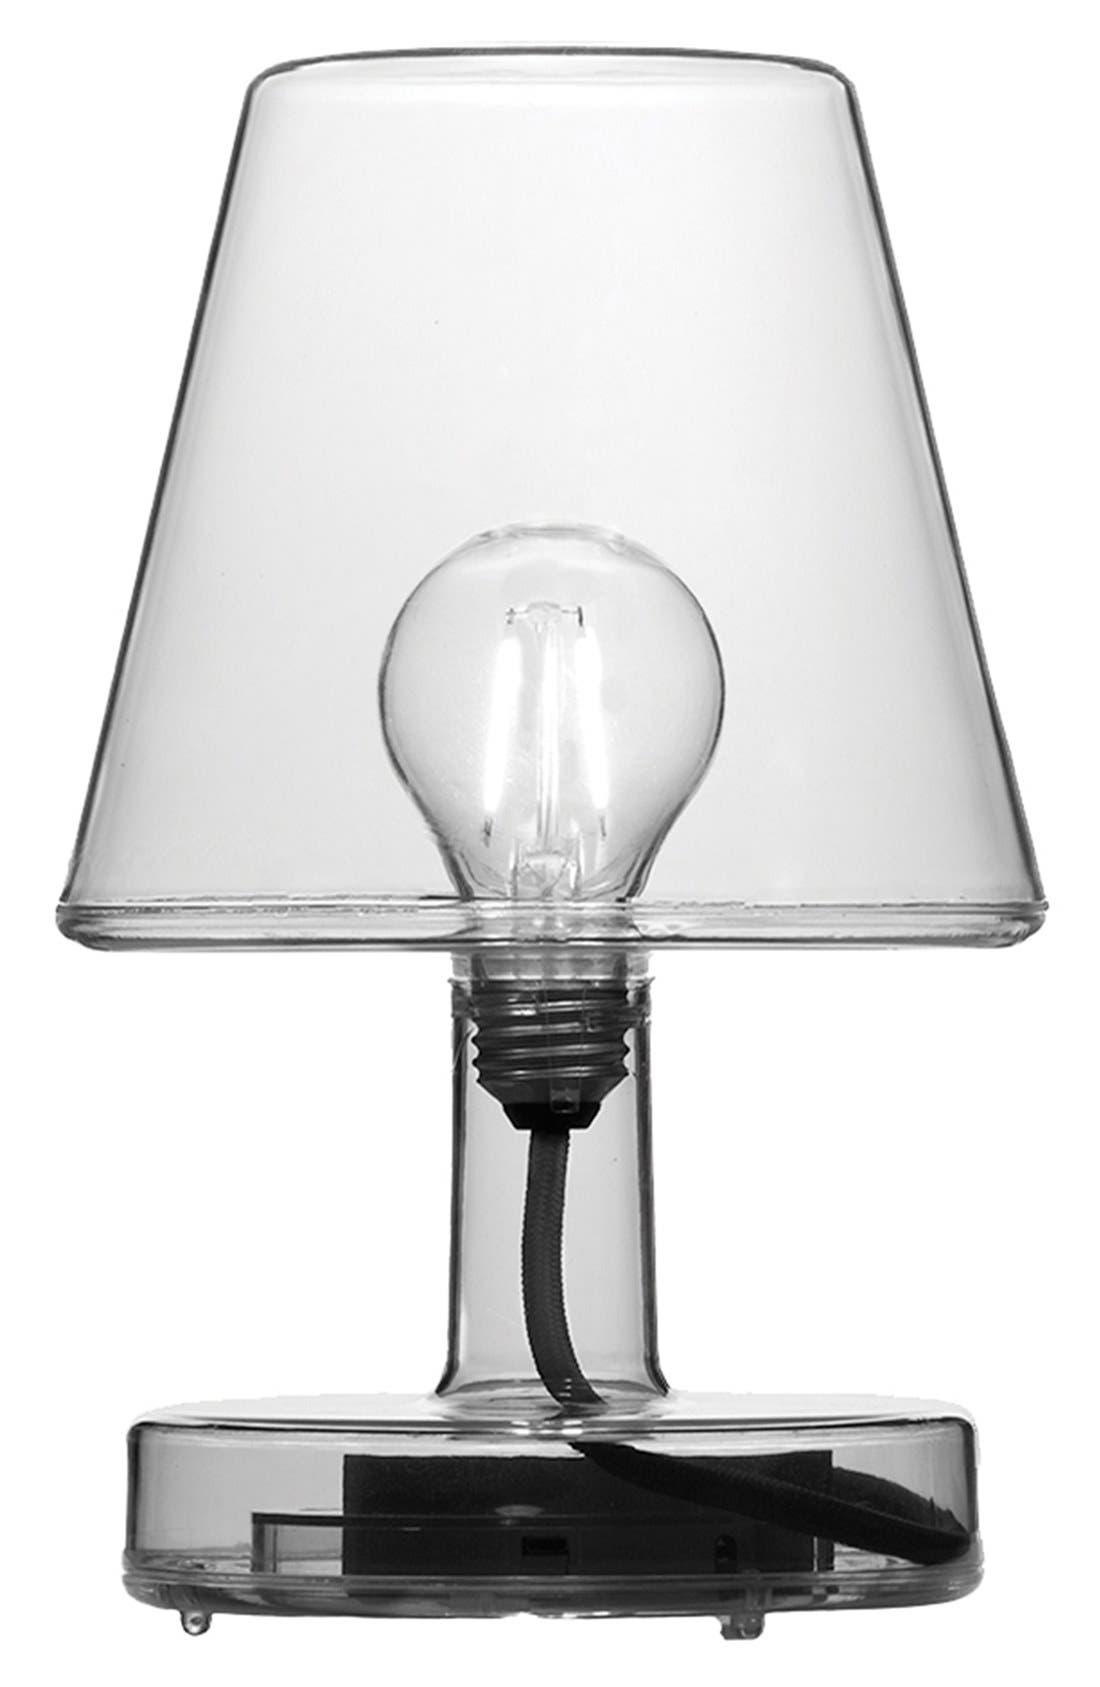 Transloetje Lamp,                         Main,                         color, Transparent